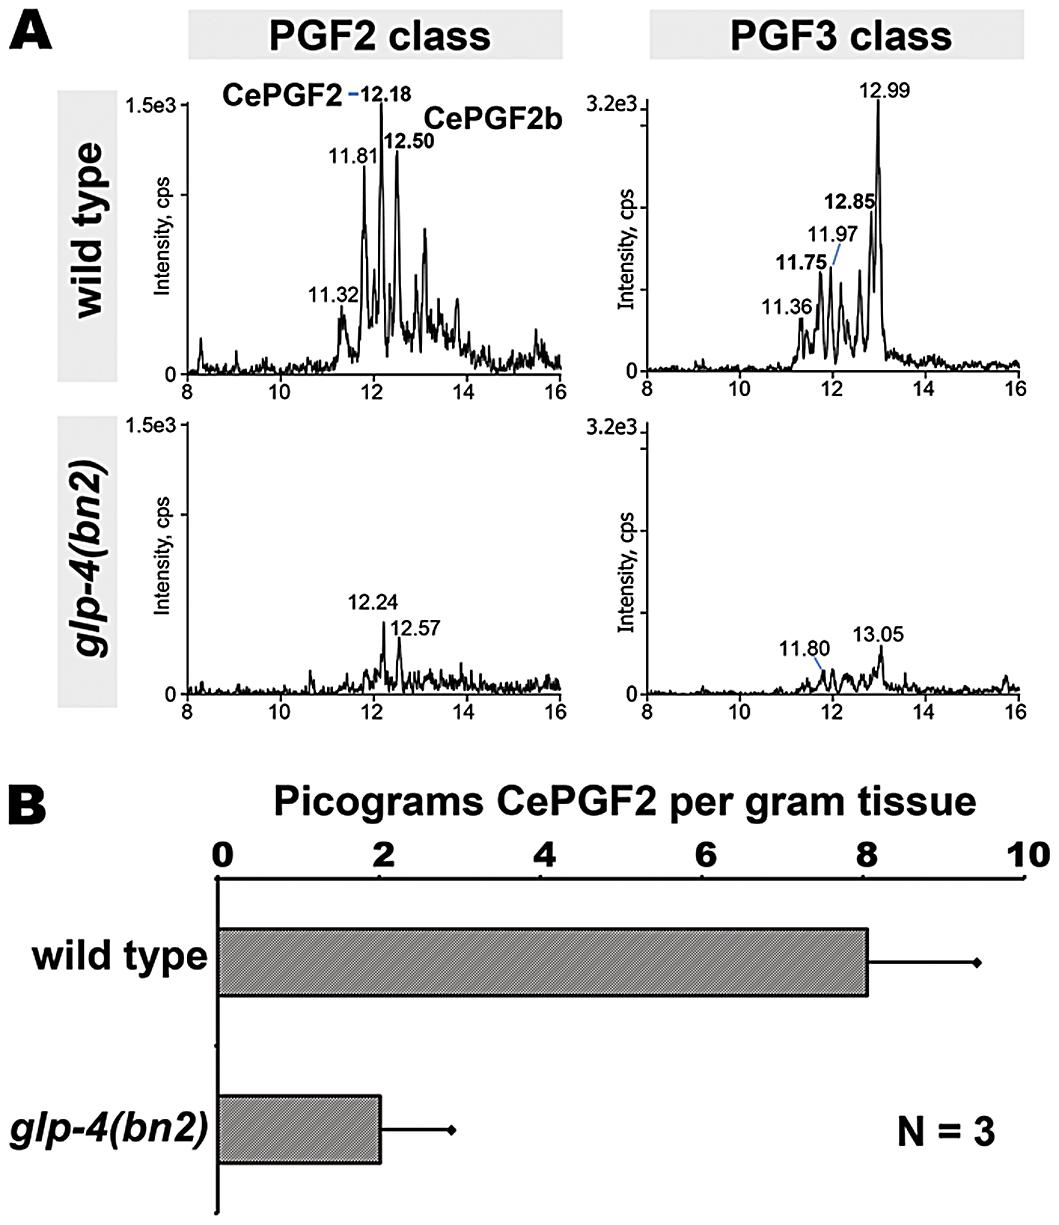 Prostaglandins in adult wild type and germline-deficient <i>glp-4</i> mutants.